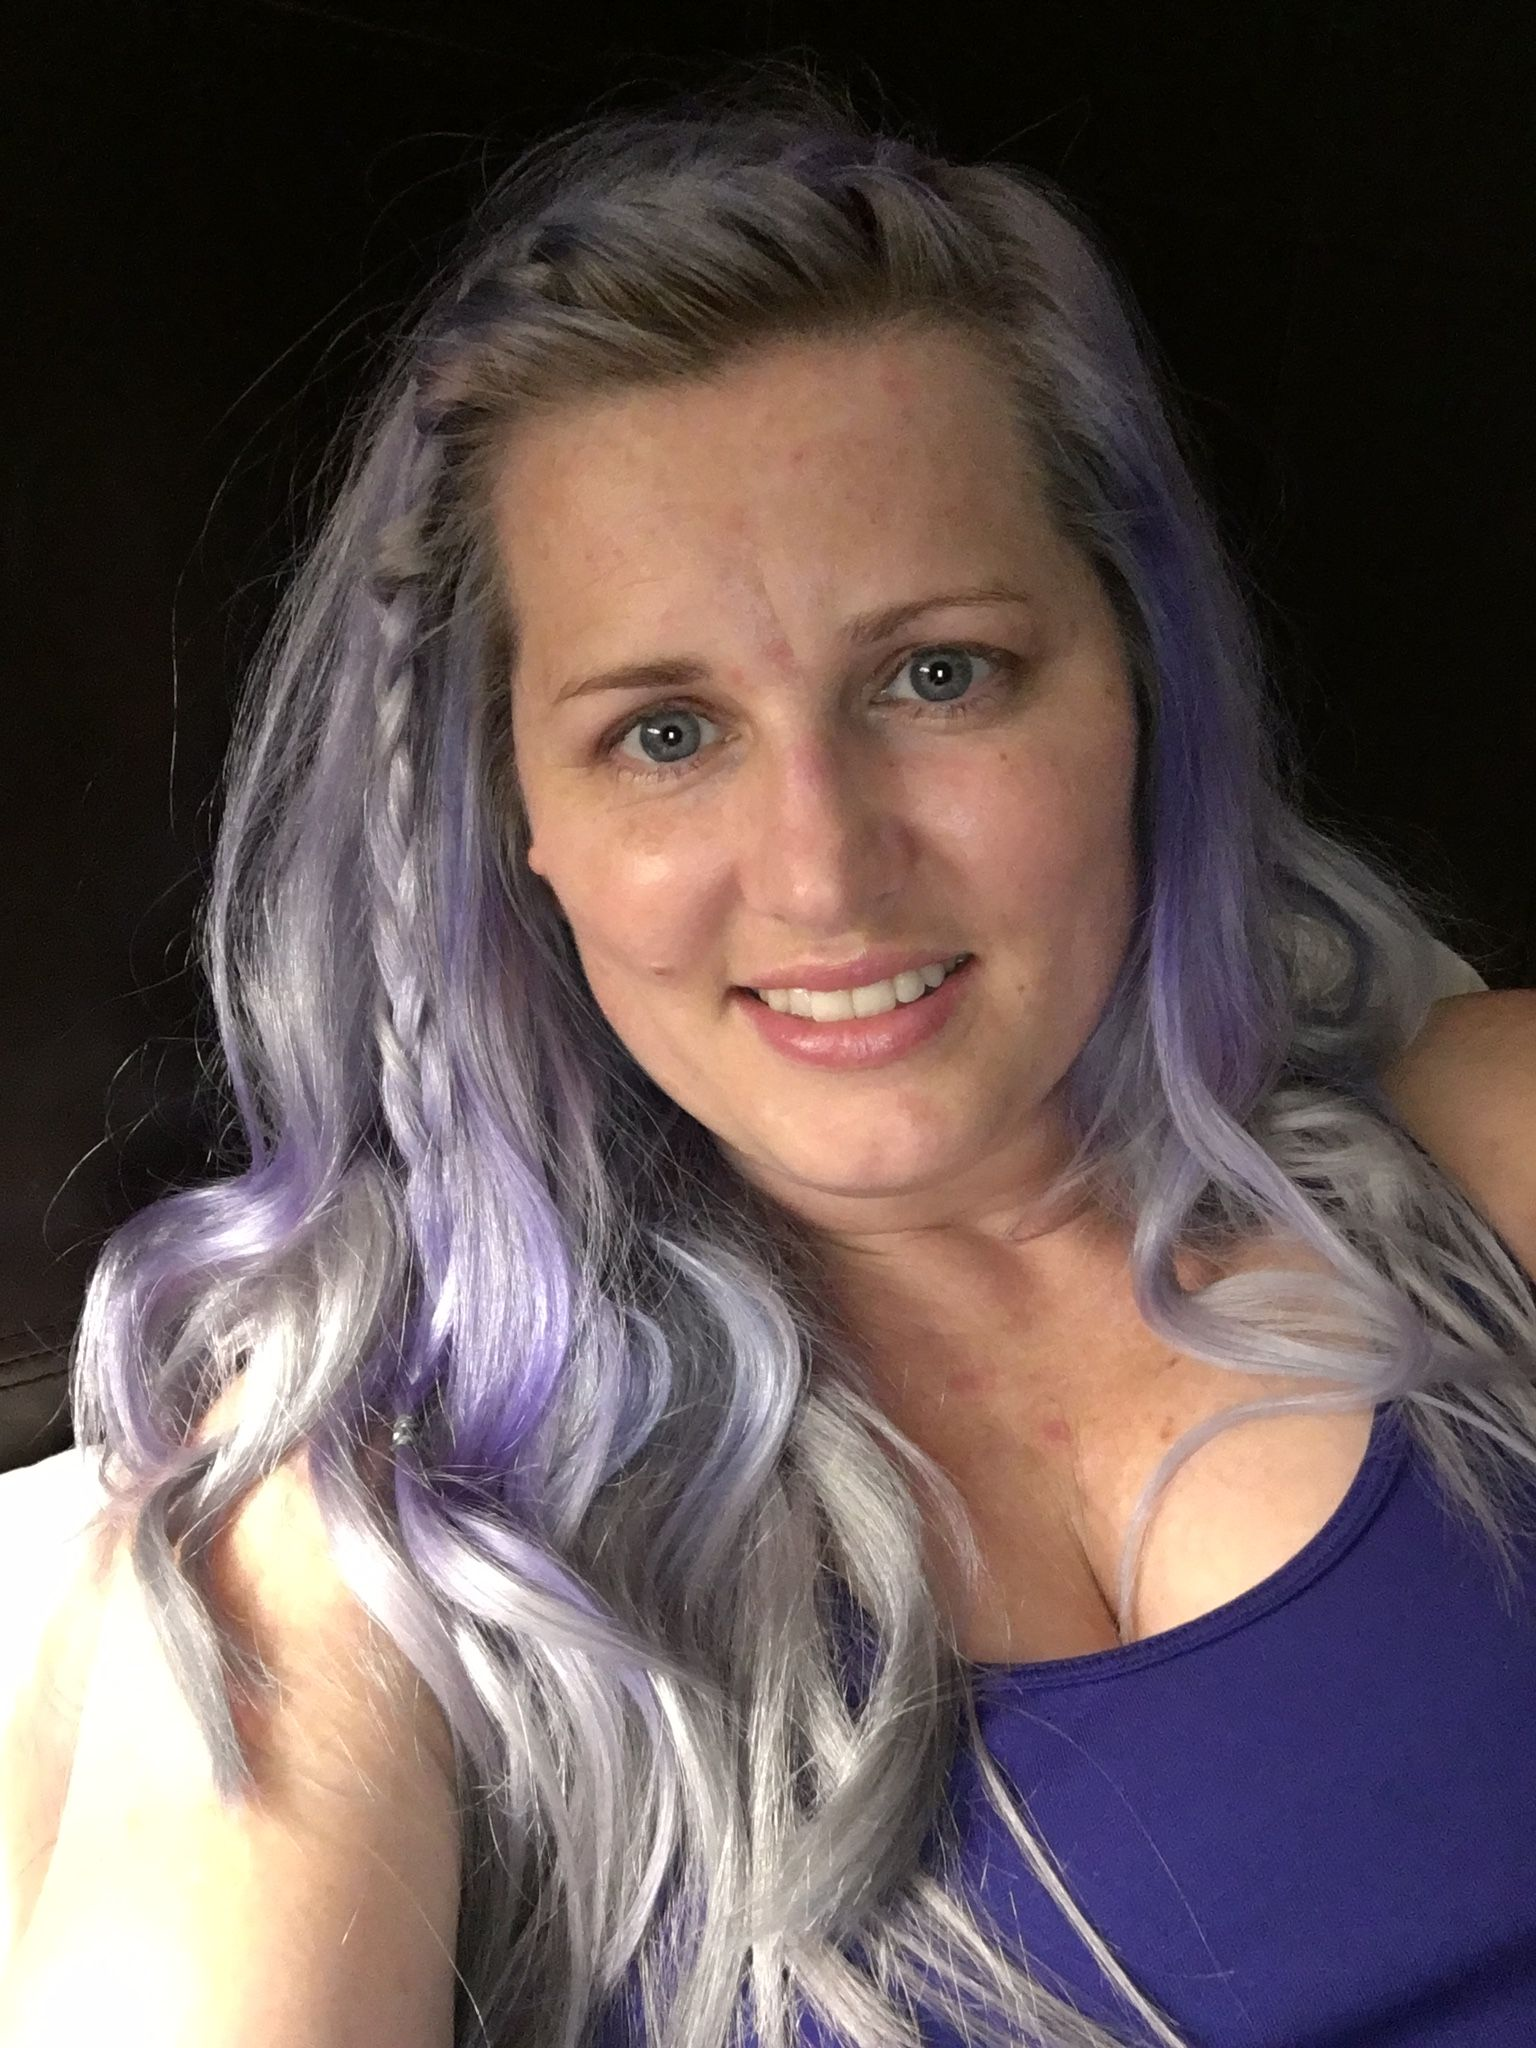 Lavender, shark blue over bleached blonde hair, ion color